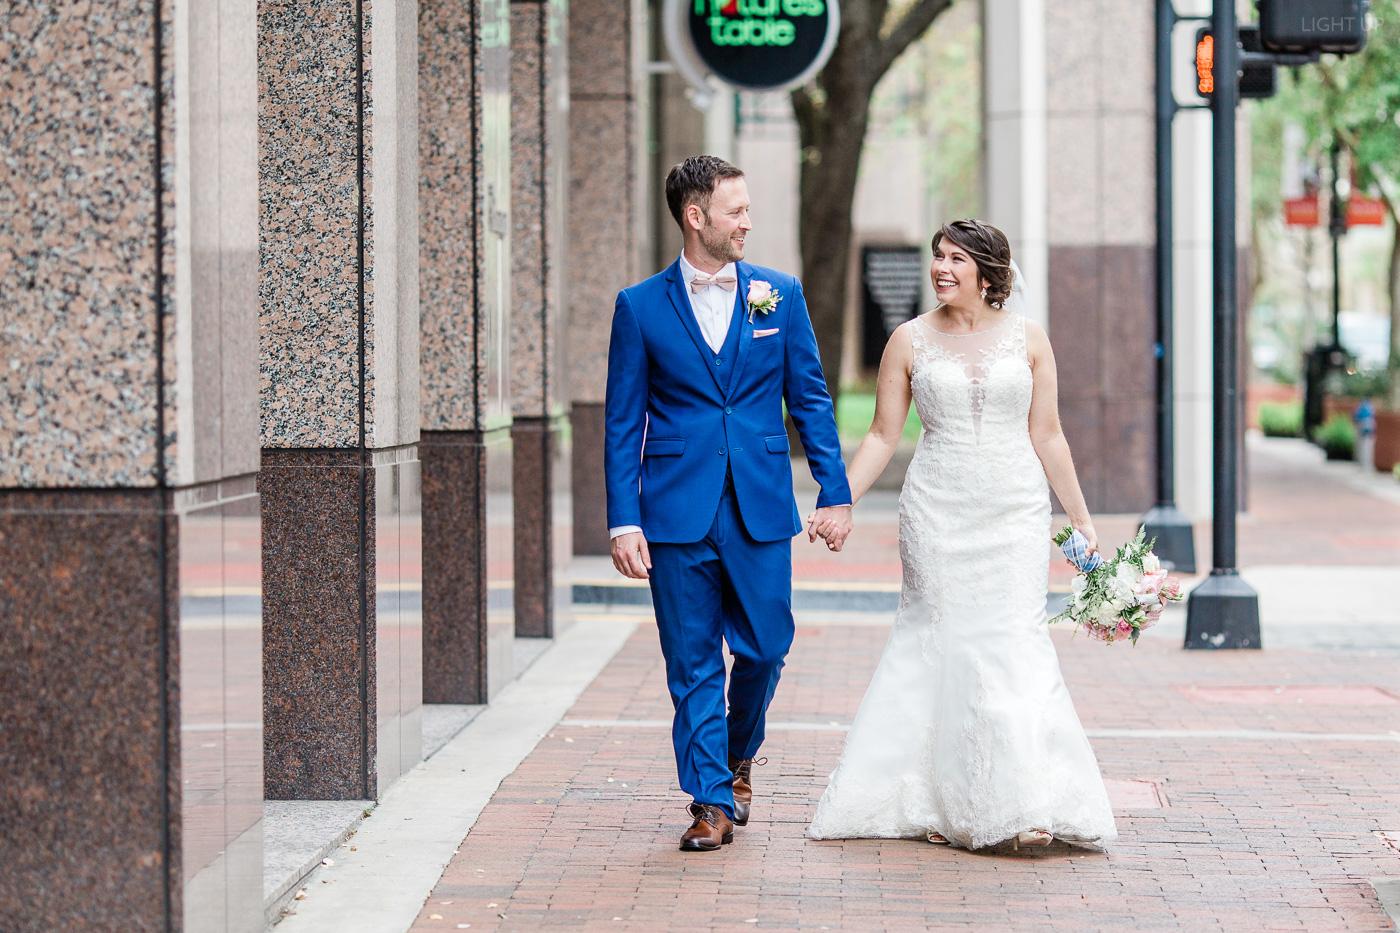 Orlando-Wedding-3.jpg